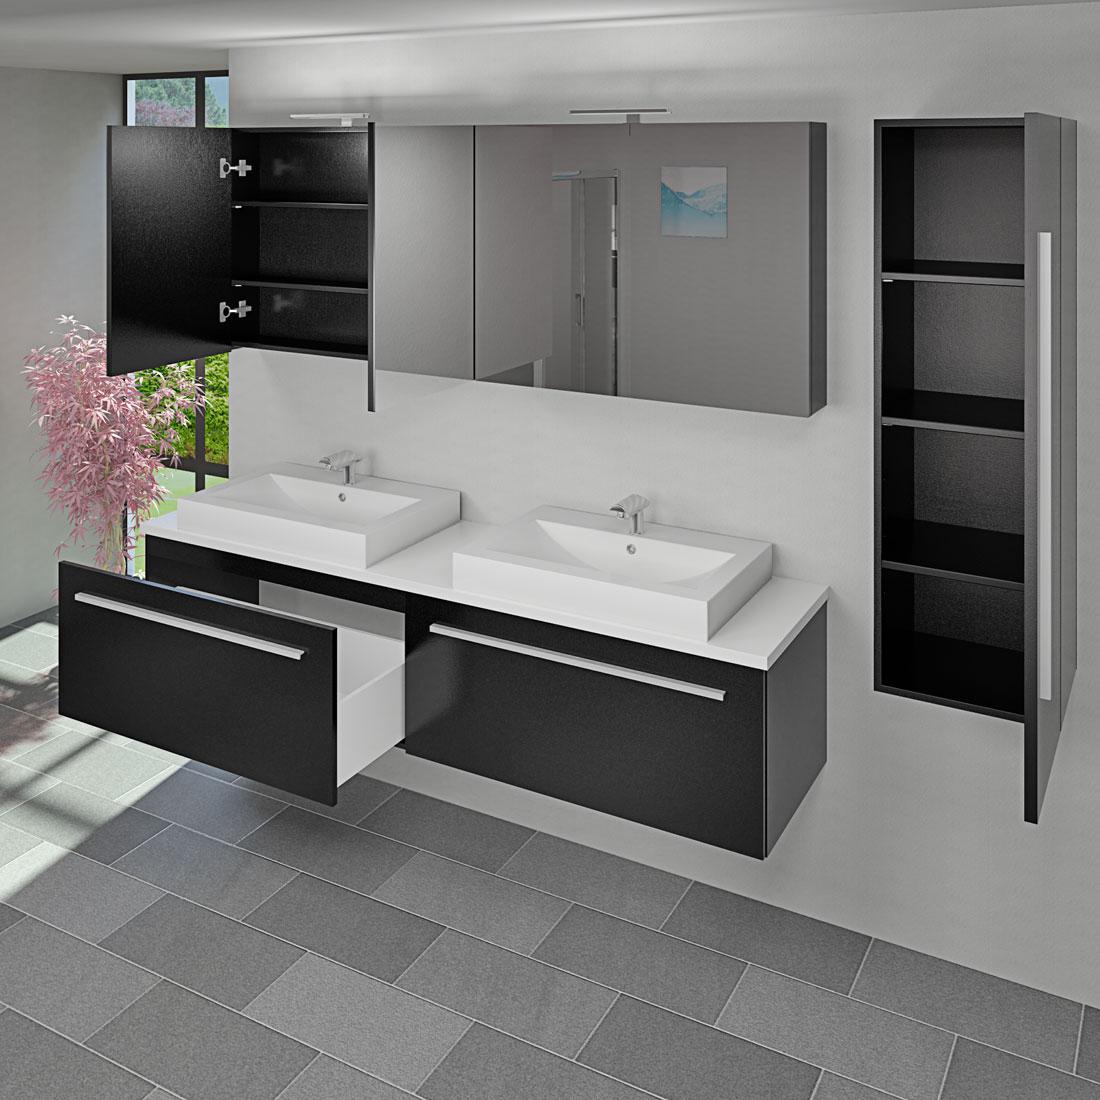 badm bel set city 200 v3 esche schwarz badezimmerm bel waschtisch 200cm. Black Bedroom Furniture Sets. Home Design Ideas